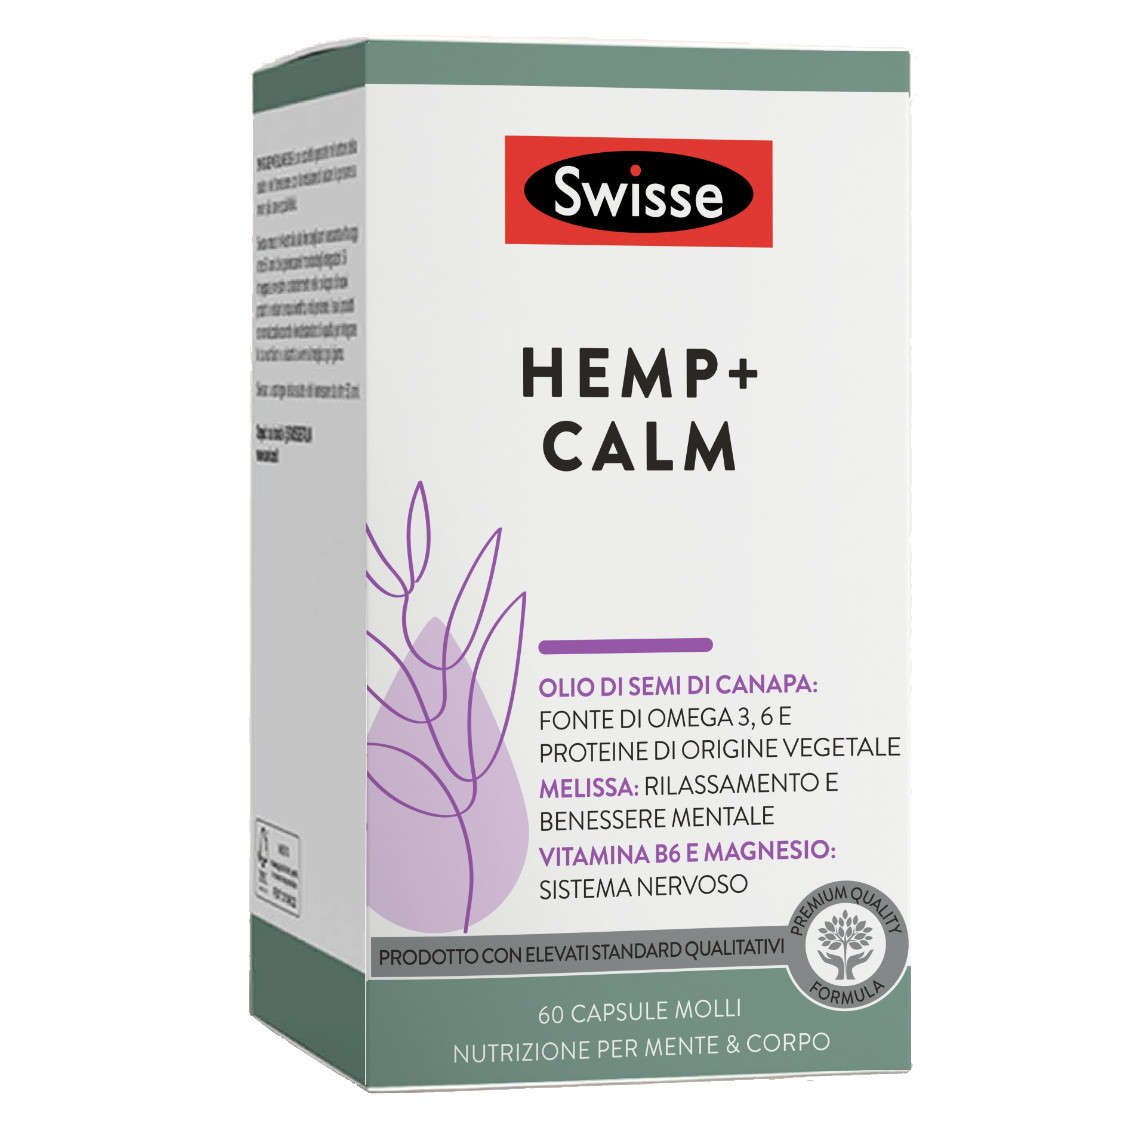 Swisse - Hemp+ - Calm